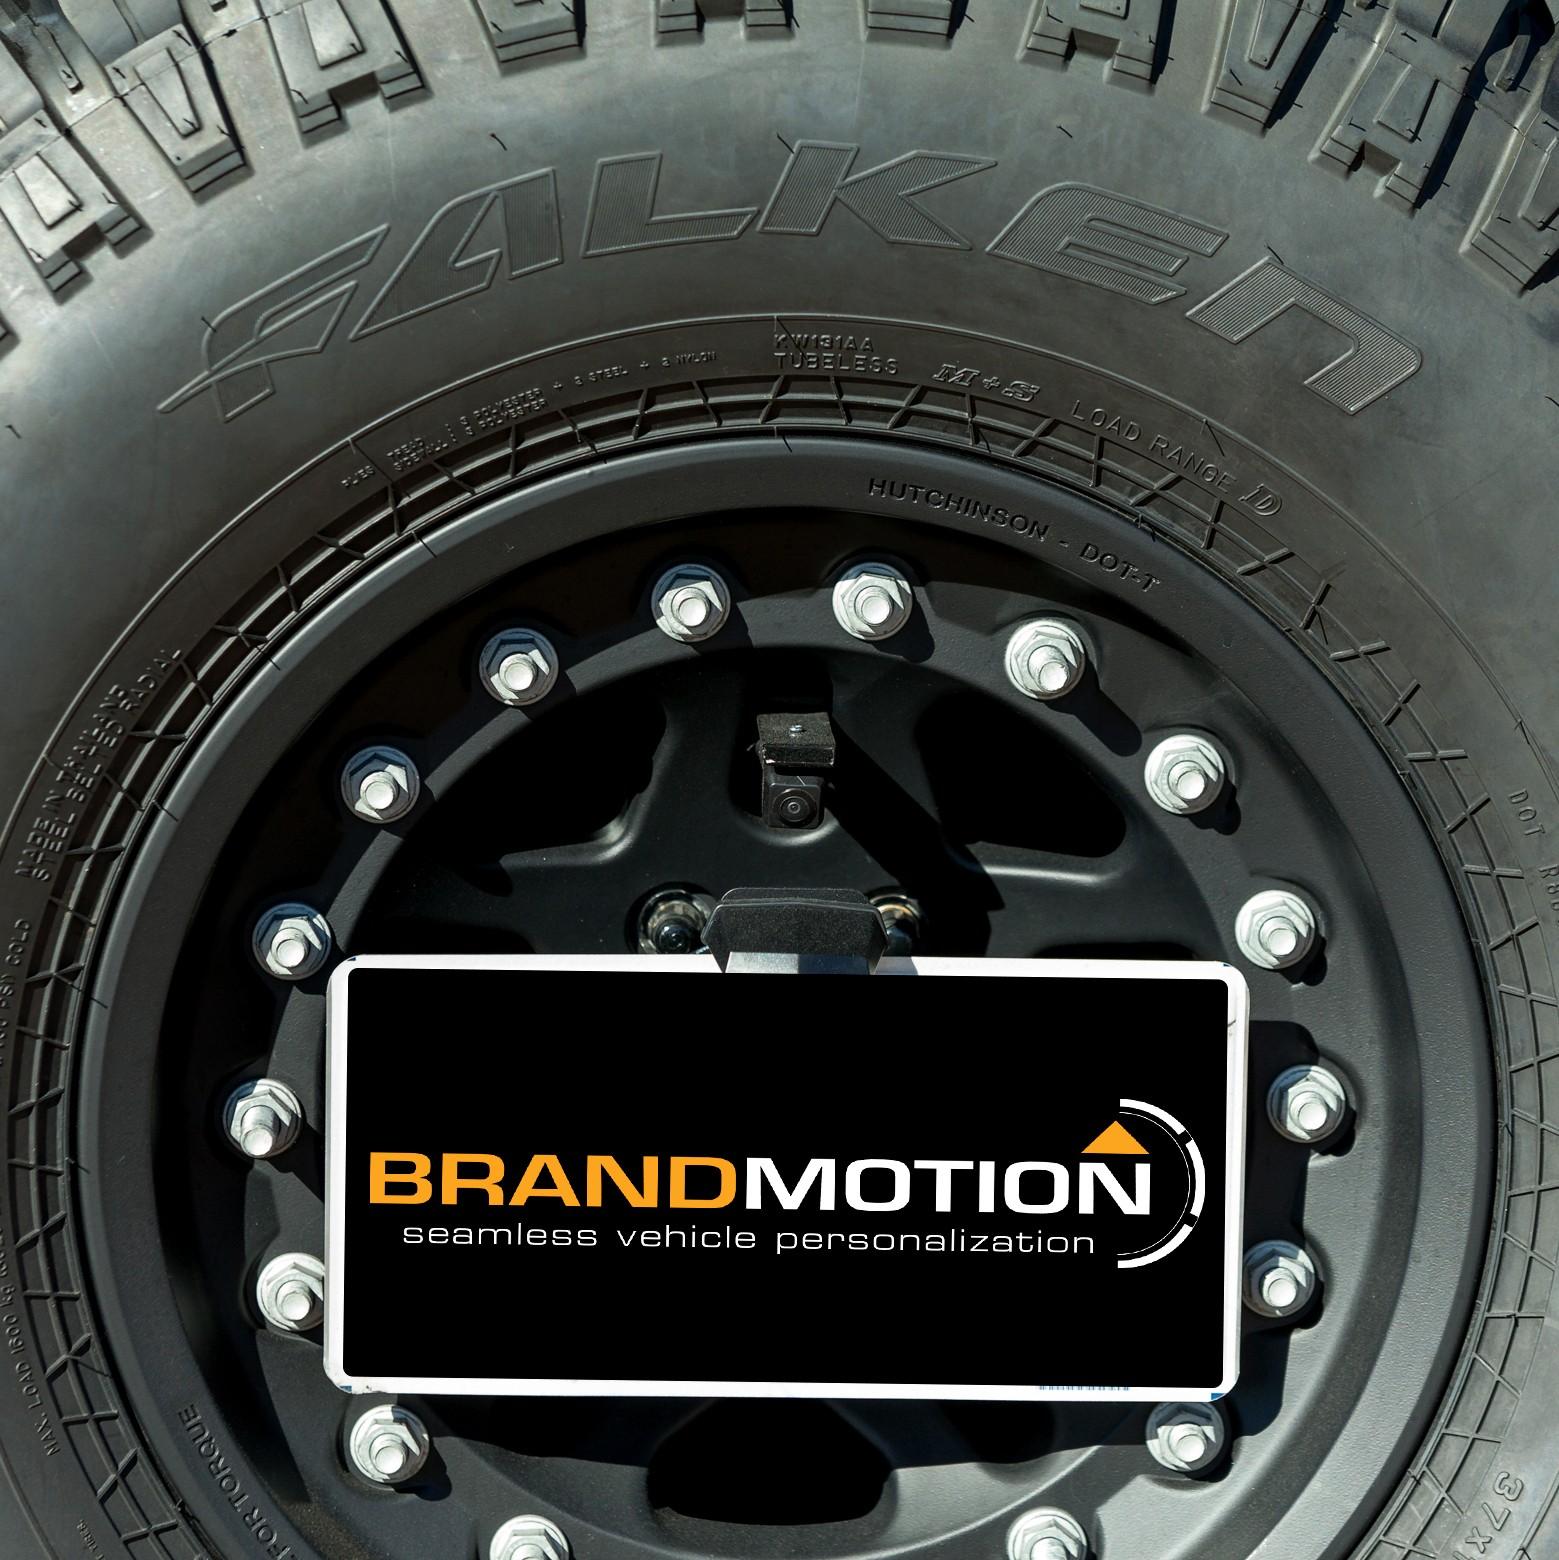 Brandmotion 9002-8847 Adjustable Rear Vision System for Factory Display Radios Jeep Wrangler 07-19